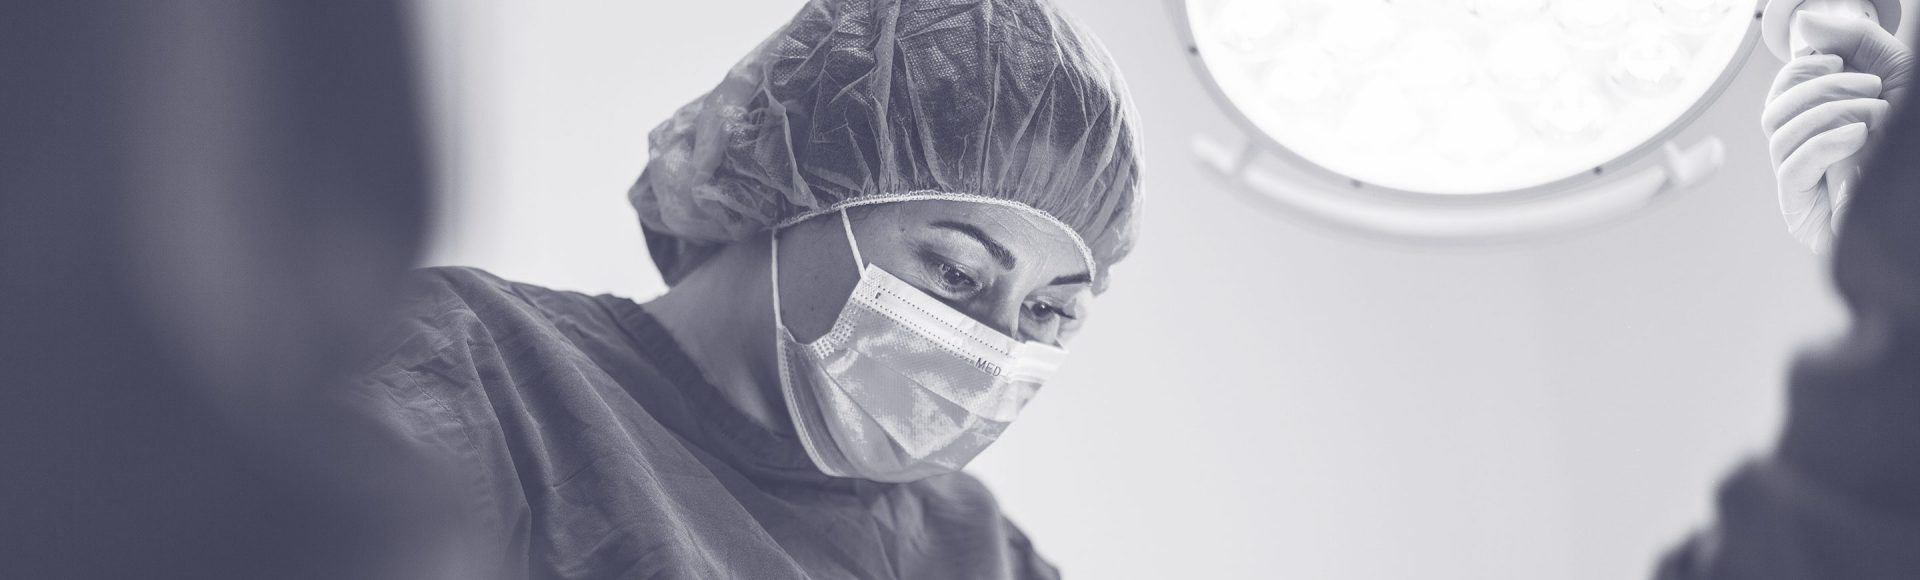 ARK-Invest_Blog-Banner_2014_05_28---Nurse-Robots-Healthcare